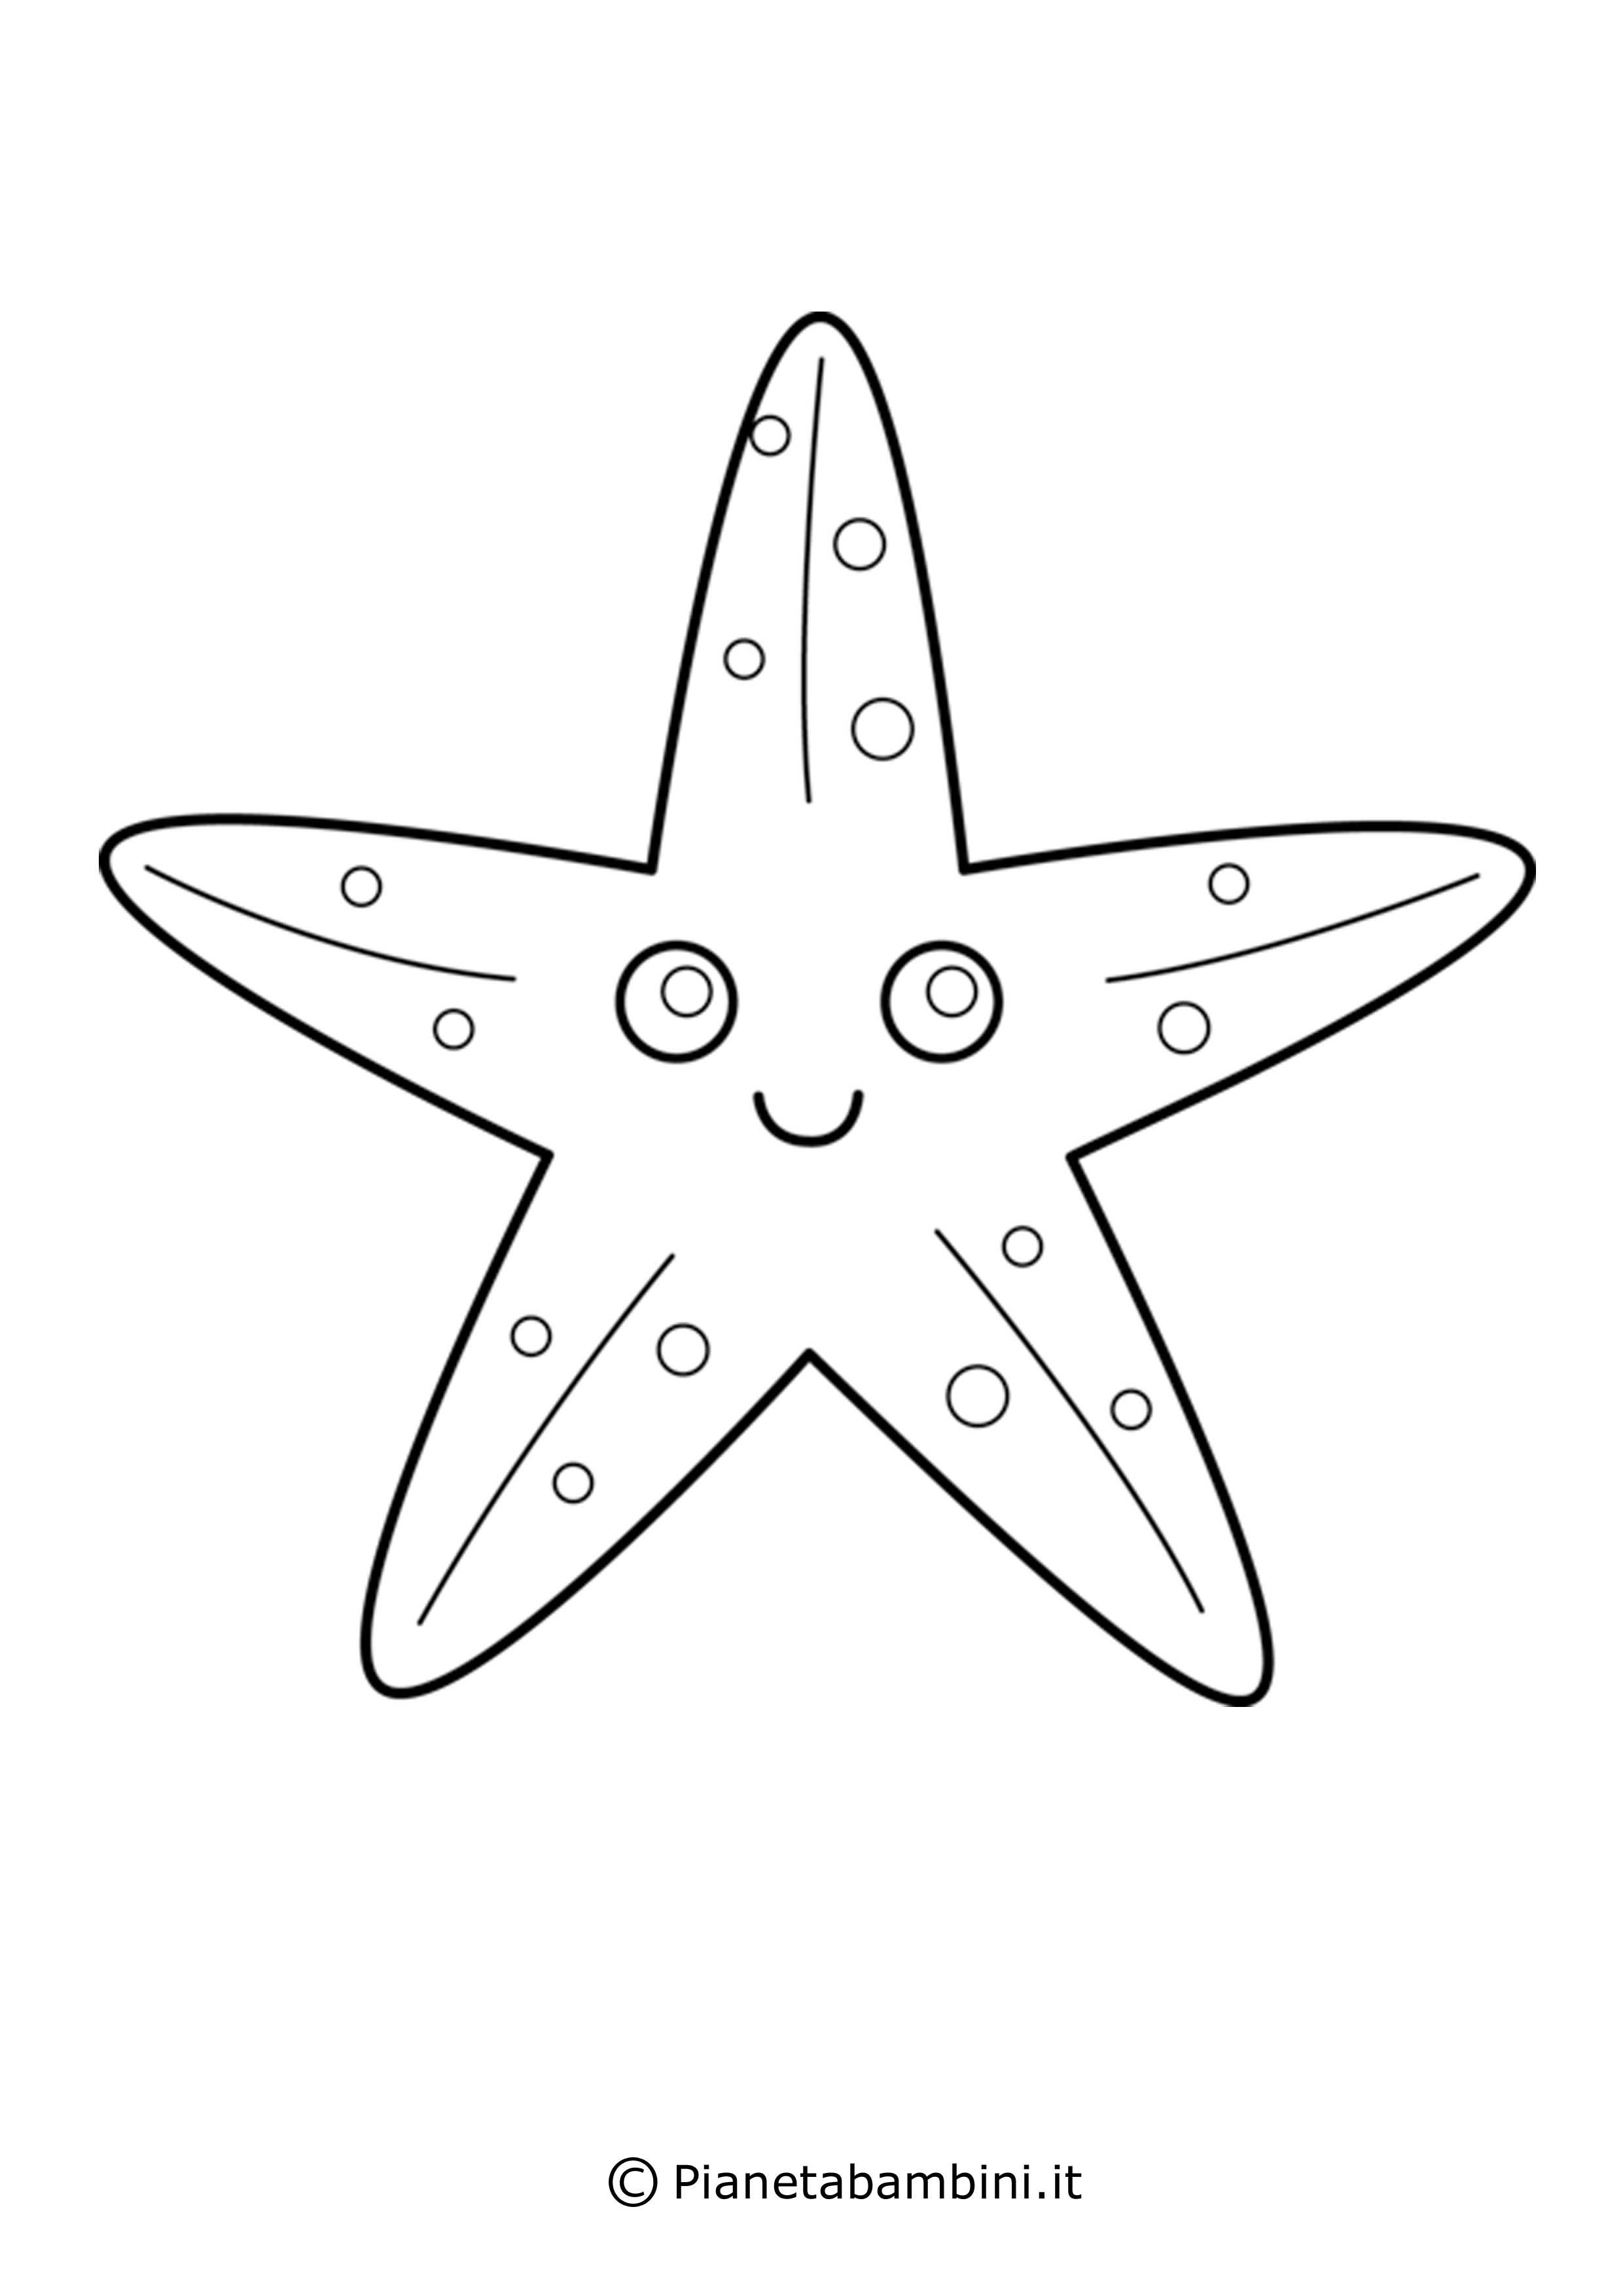 Stella marina sorridente